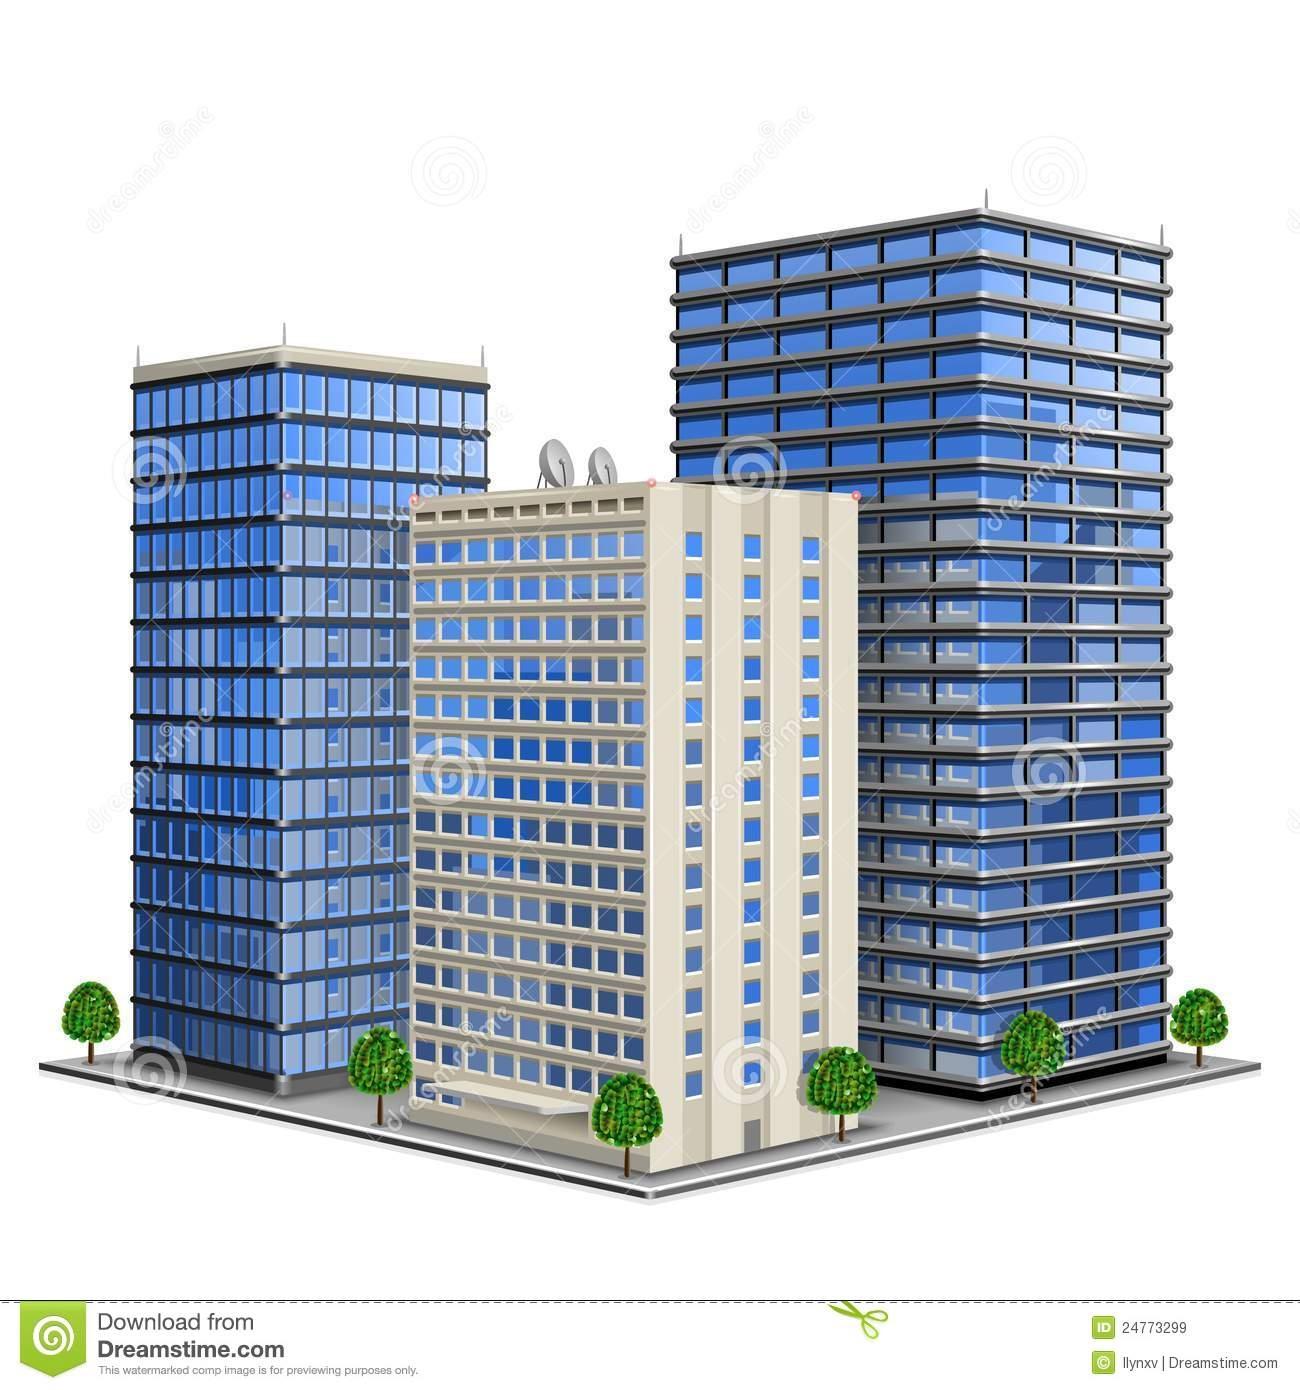 Office Building Clipart - clipartsgram c-Office Building Clipart - clipartsgram clipartall clipartall.com-4